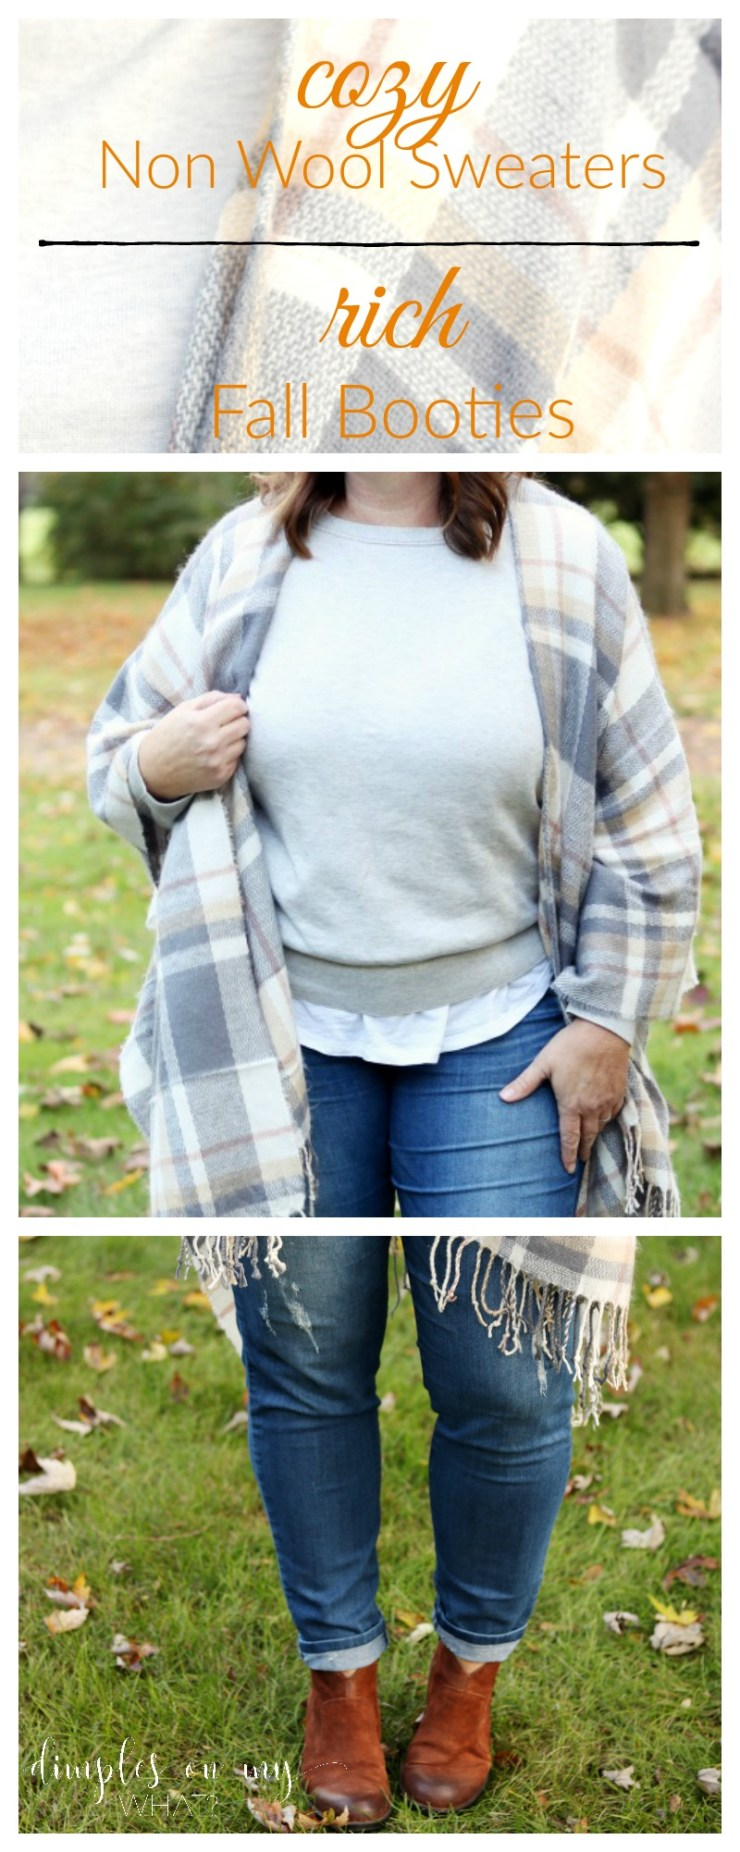 Fall Fashion | Fashion for Women Over 50 | Plus Sized Fashion | Fall Fashion